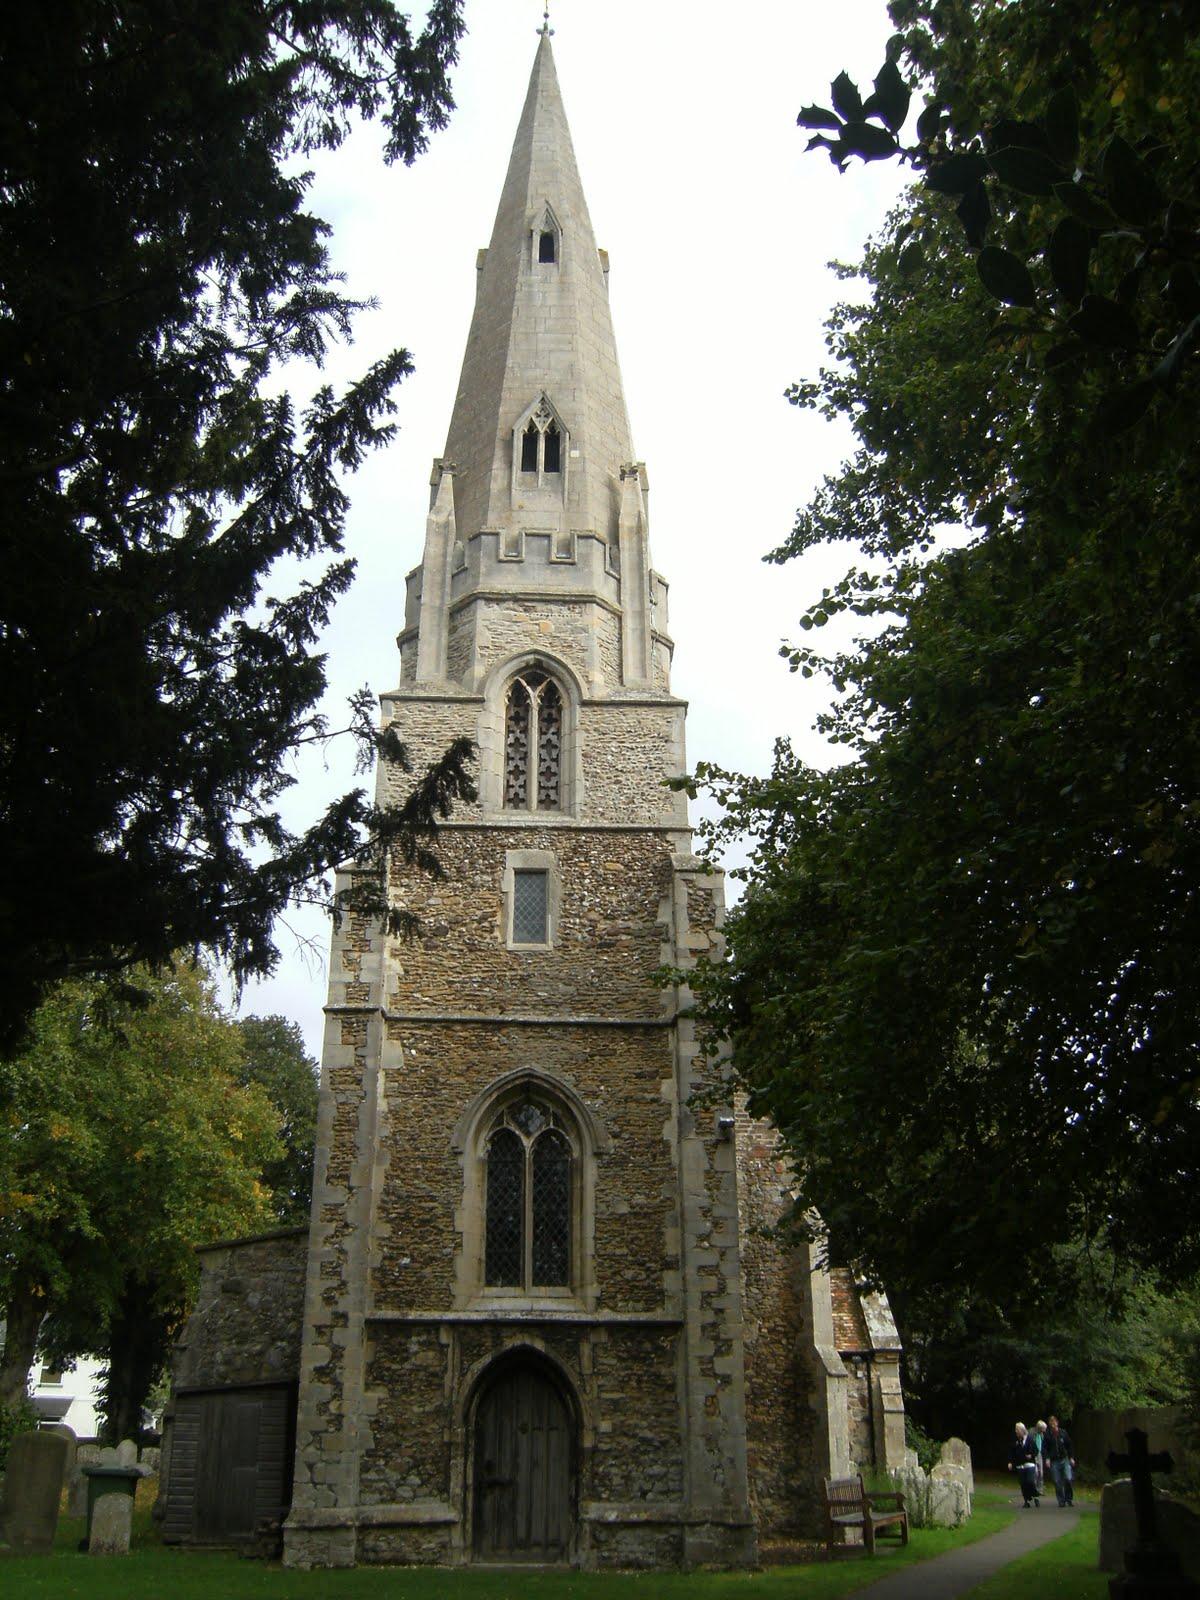 DSCF9463 St Mary the Virgin church, Houghton